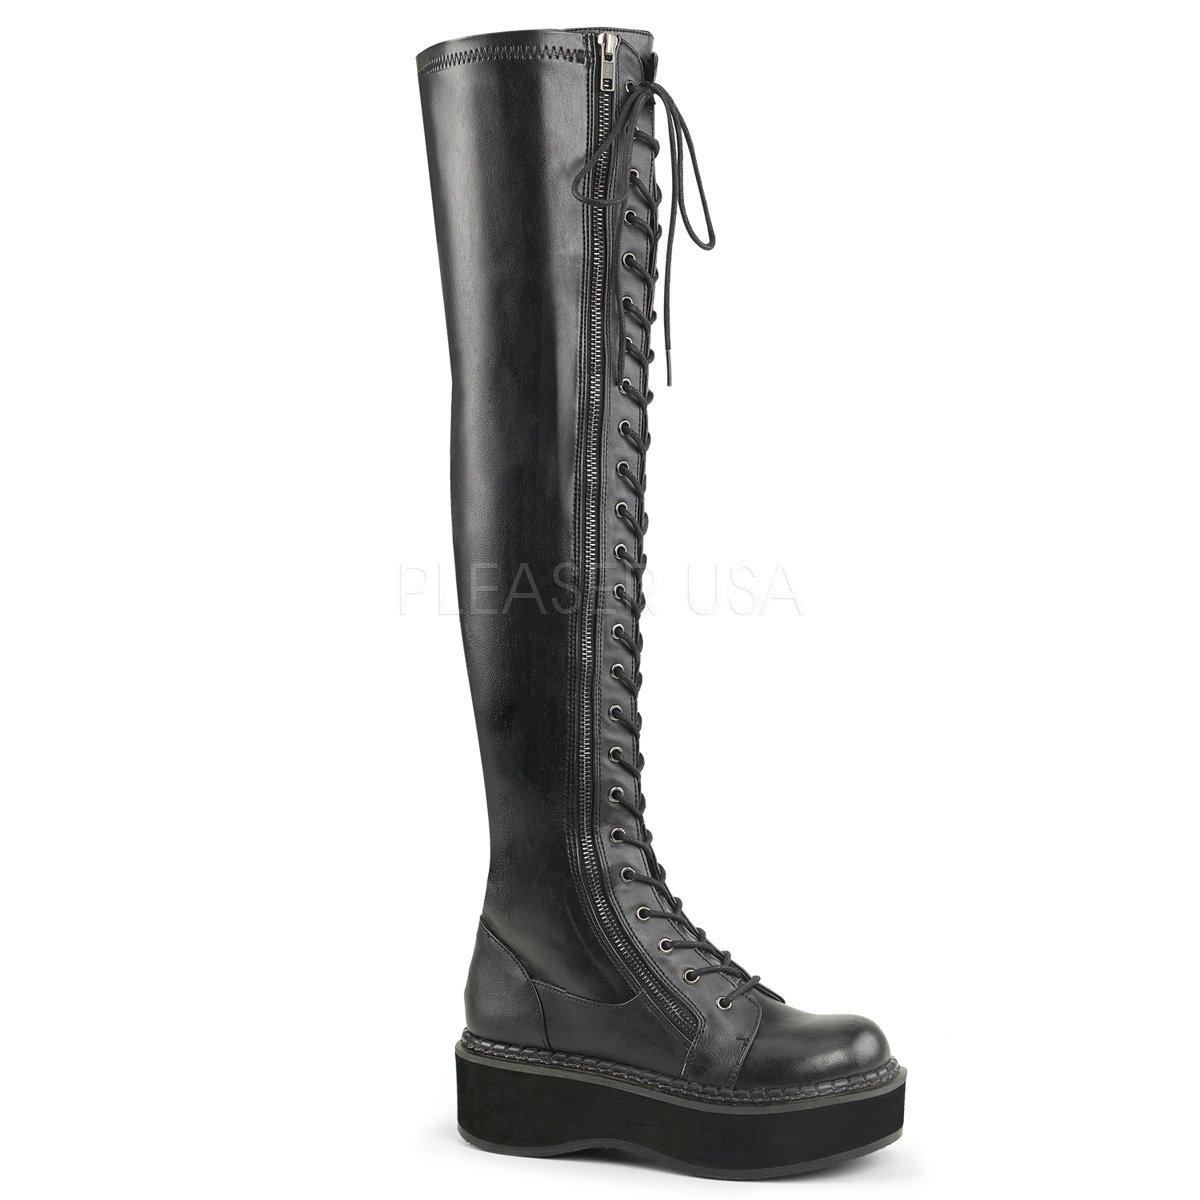 Demonia Women's Emily-375 Over The Knee Boot, Black Str Vegan Leather, 7 M US